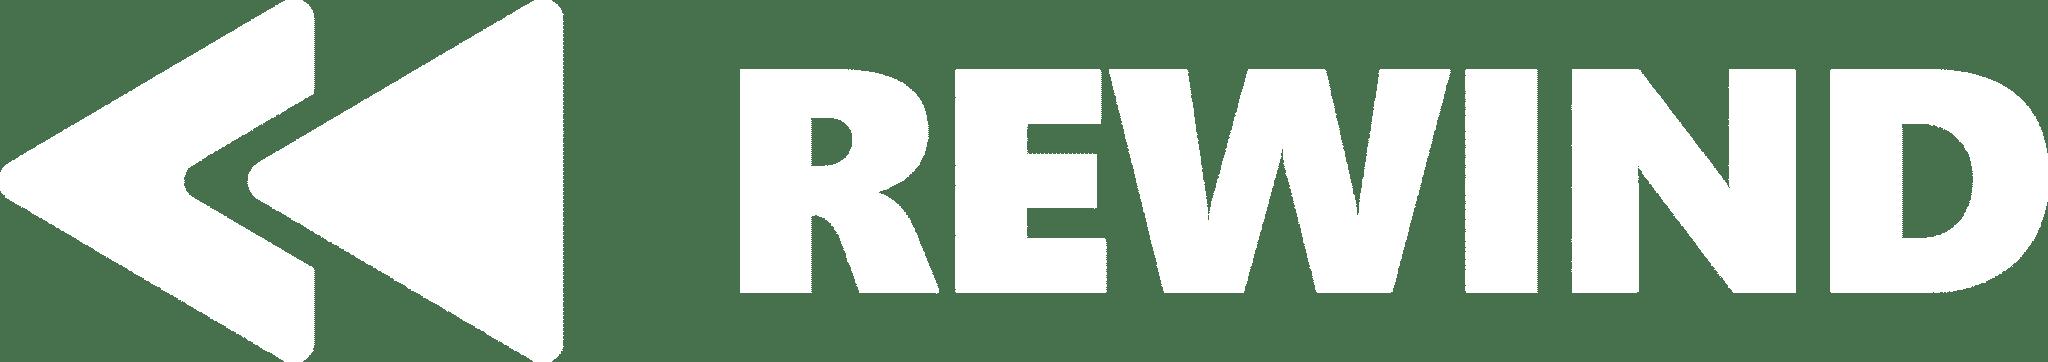 REWIND.sk - Filmy, seriály, hry, technológie, zábava